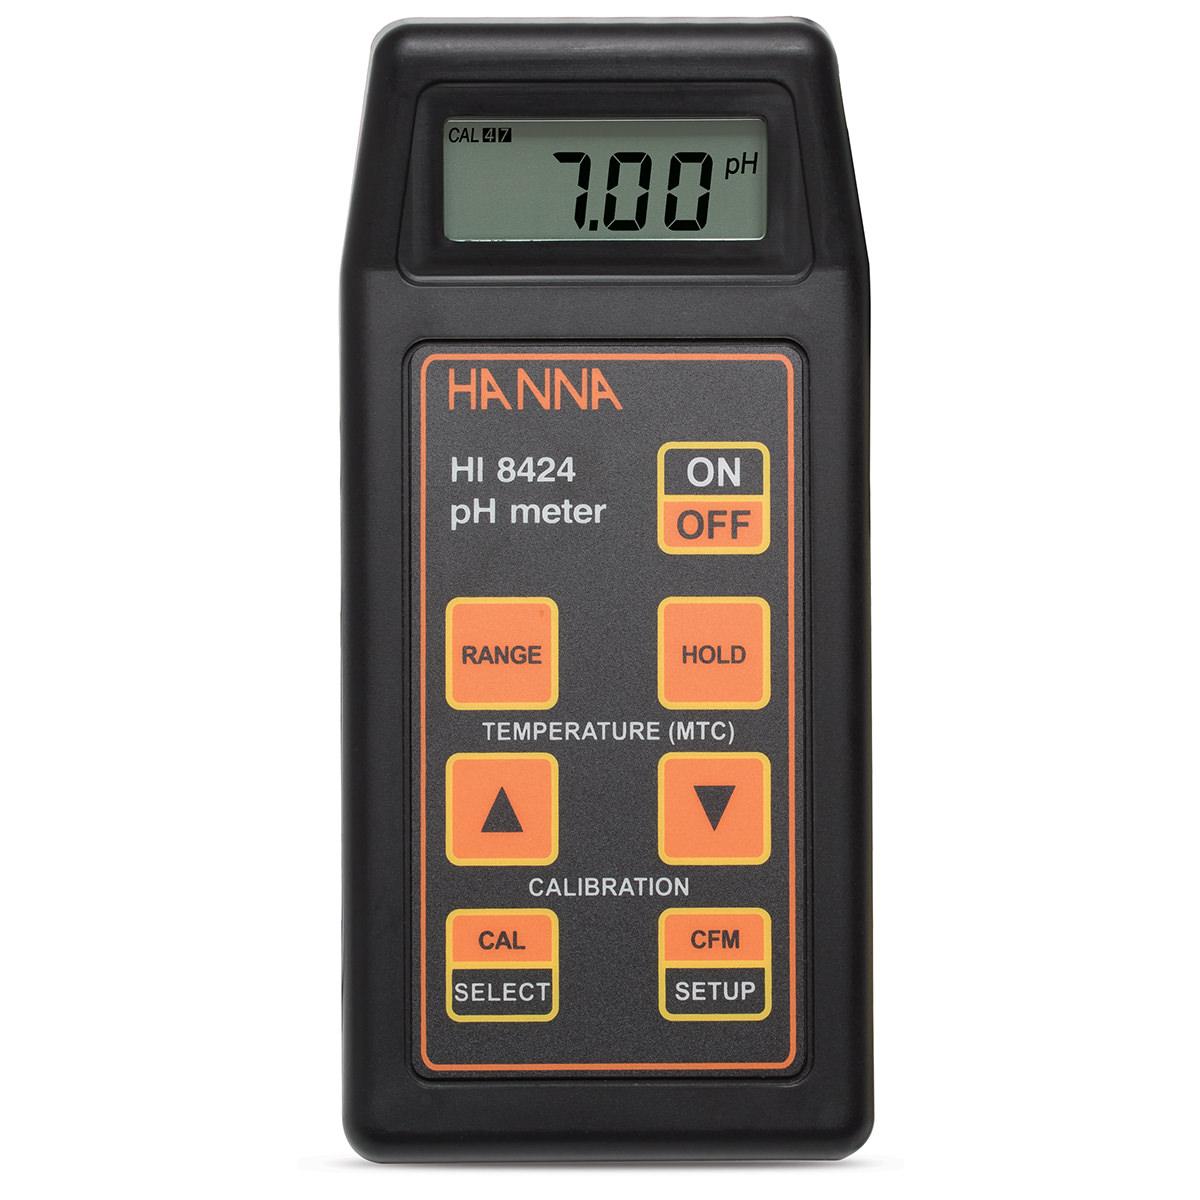 Portable pH/mV Meter - HI8424